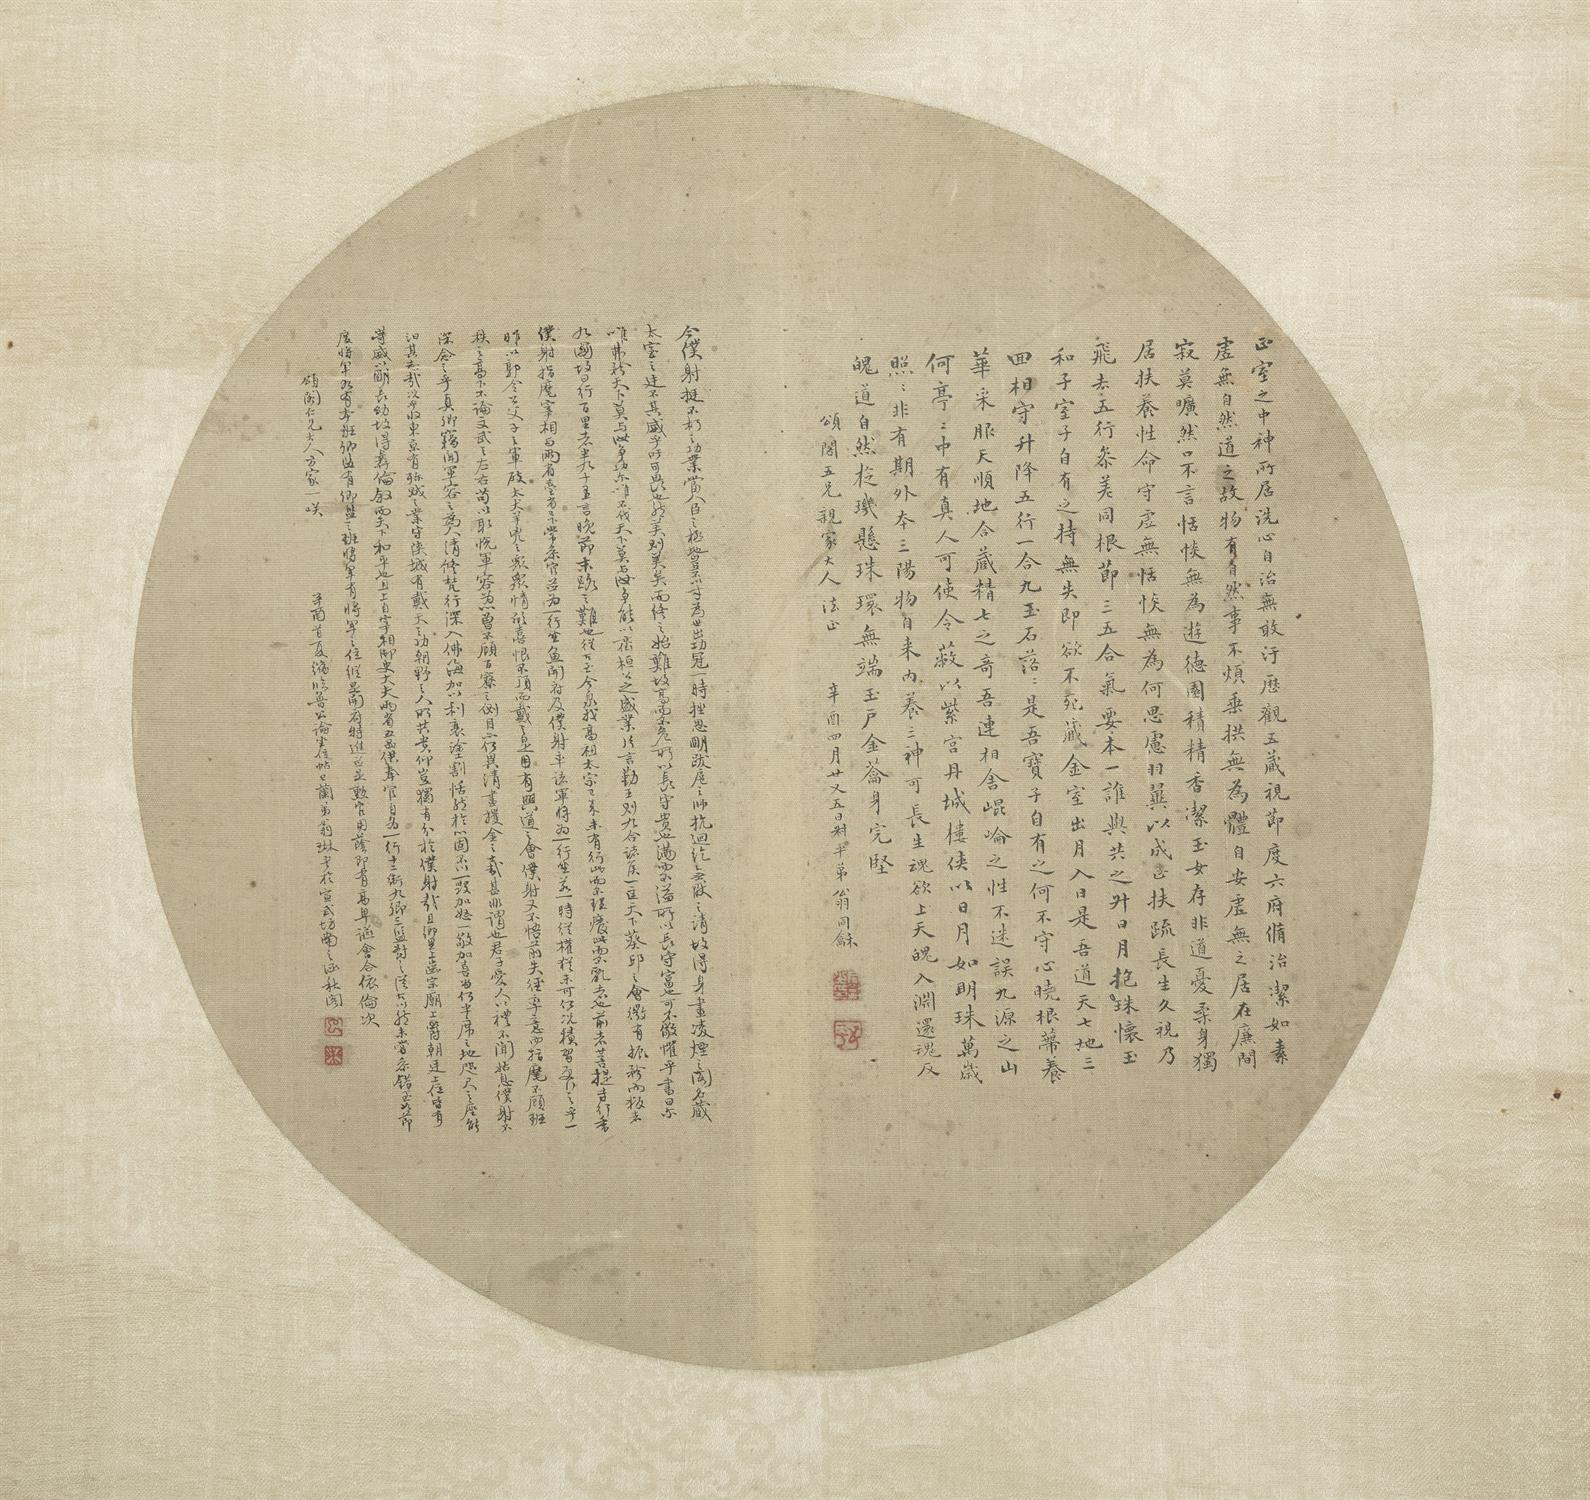 CHINESE SCHOOL, PAN ZENGYING 潘冬莹 (1808-1878), WENG TONGHE 翁同龢 (1830-1904) AND ZHANG ZHIWAN 张之万 ( - Image 4 of 8